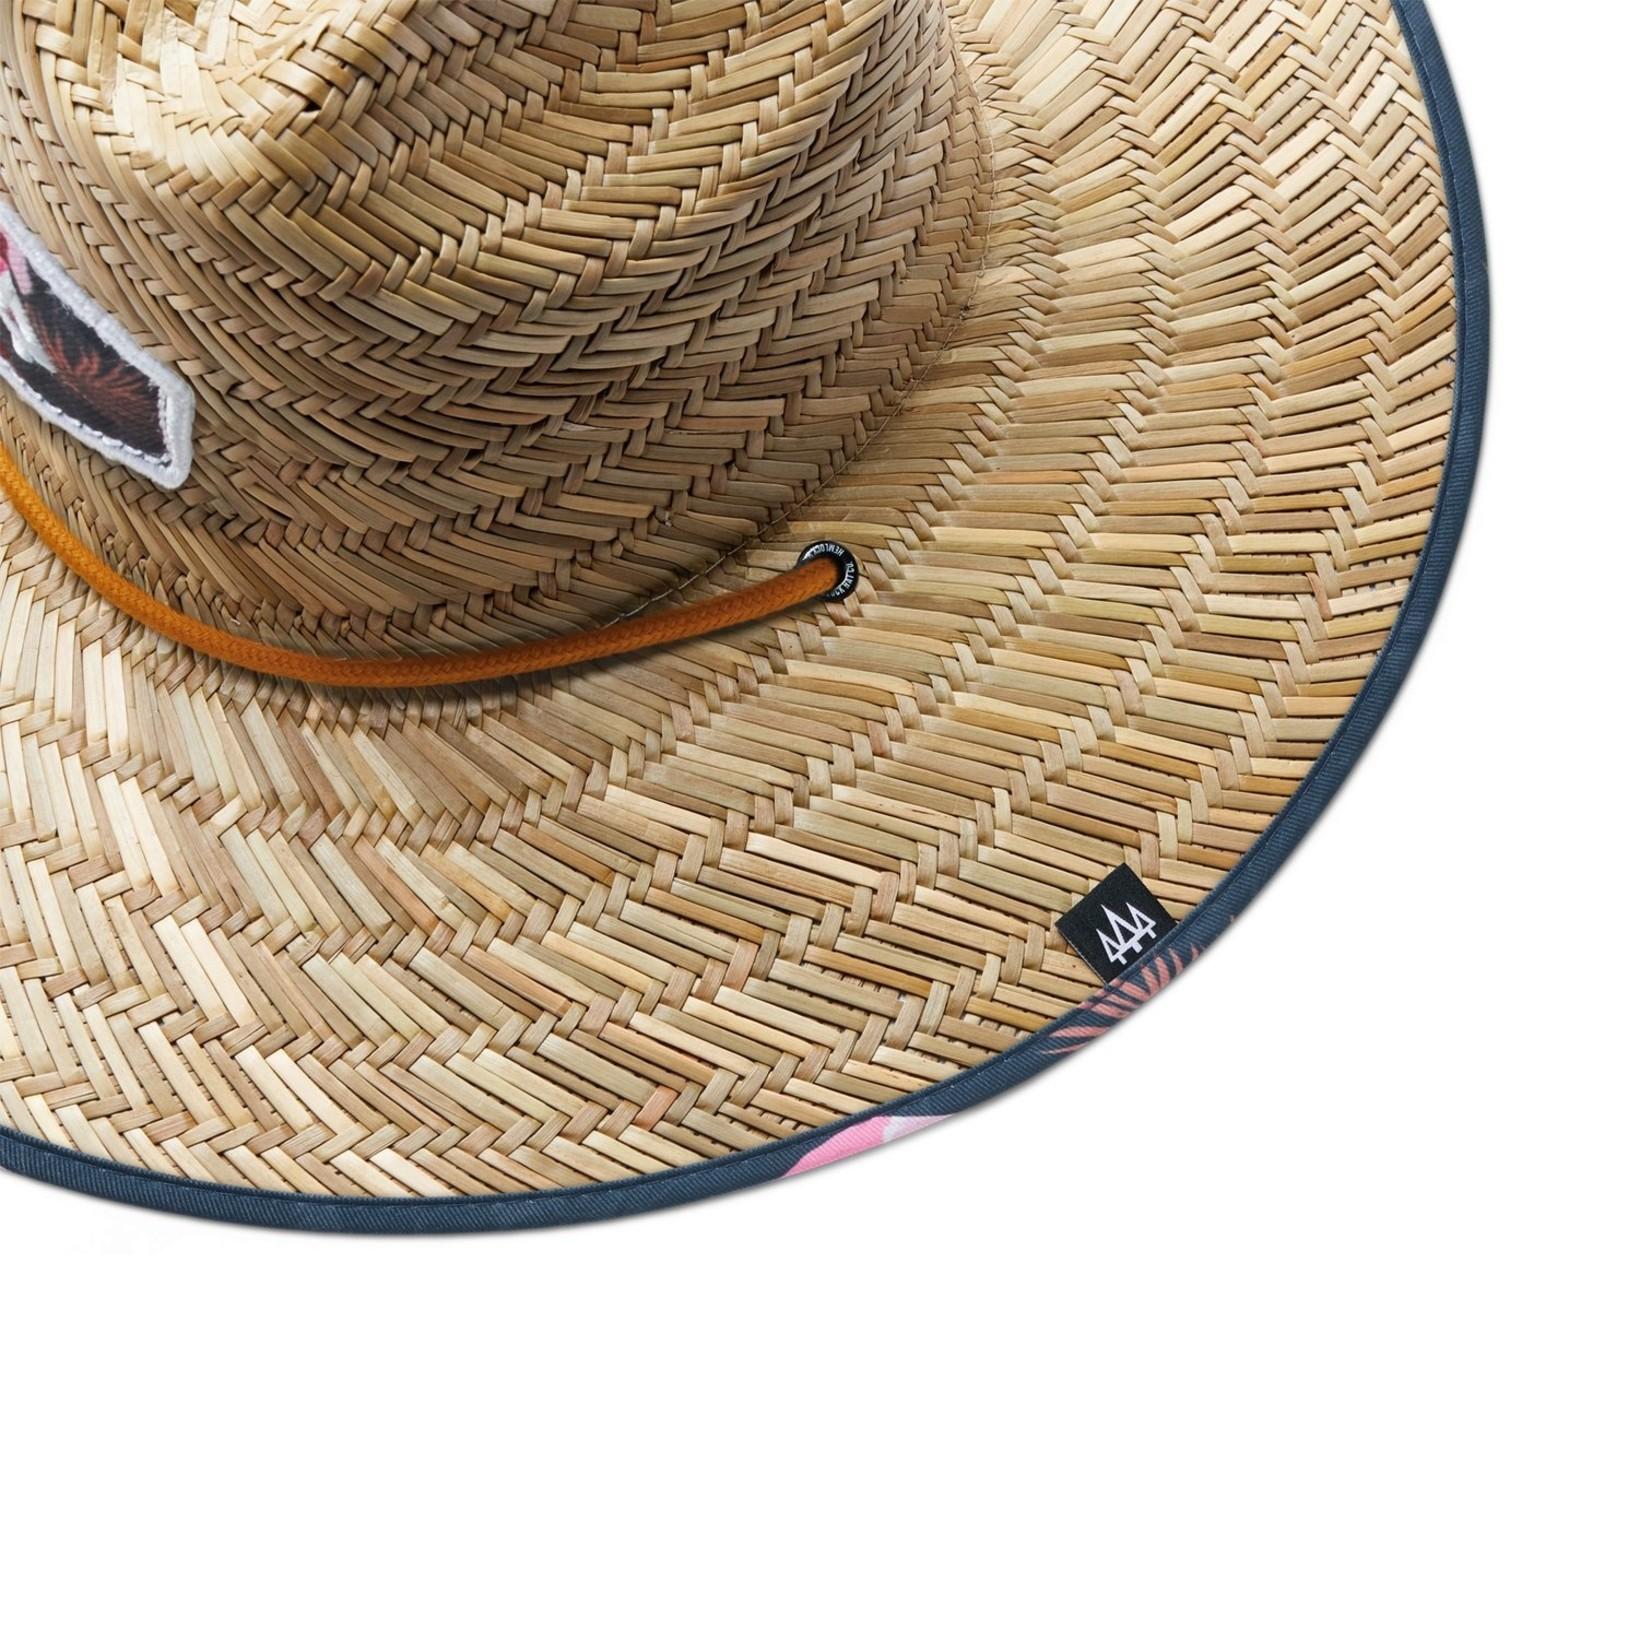 Hemlock Hat Co. Hemlock Hat Co. - Rio